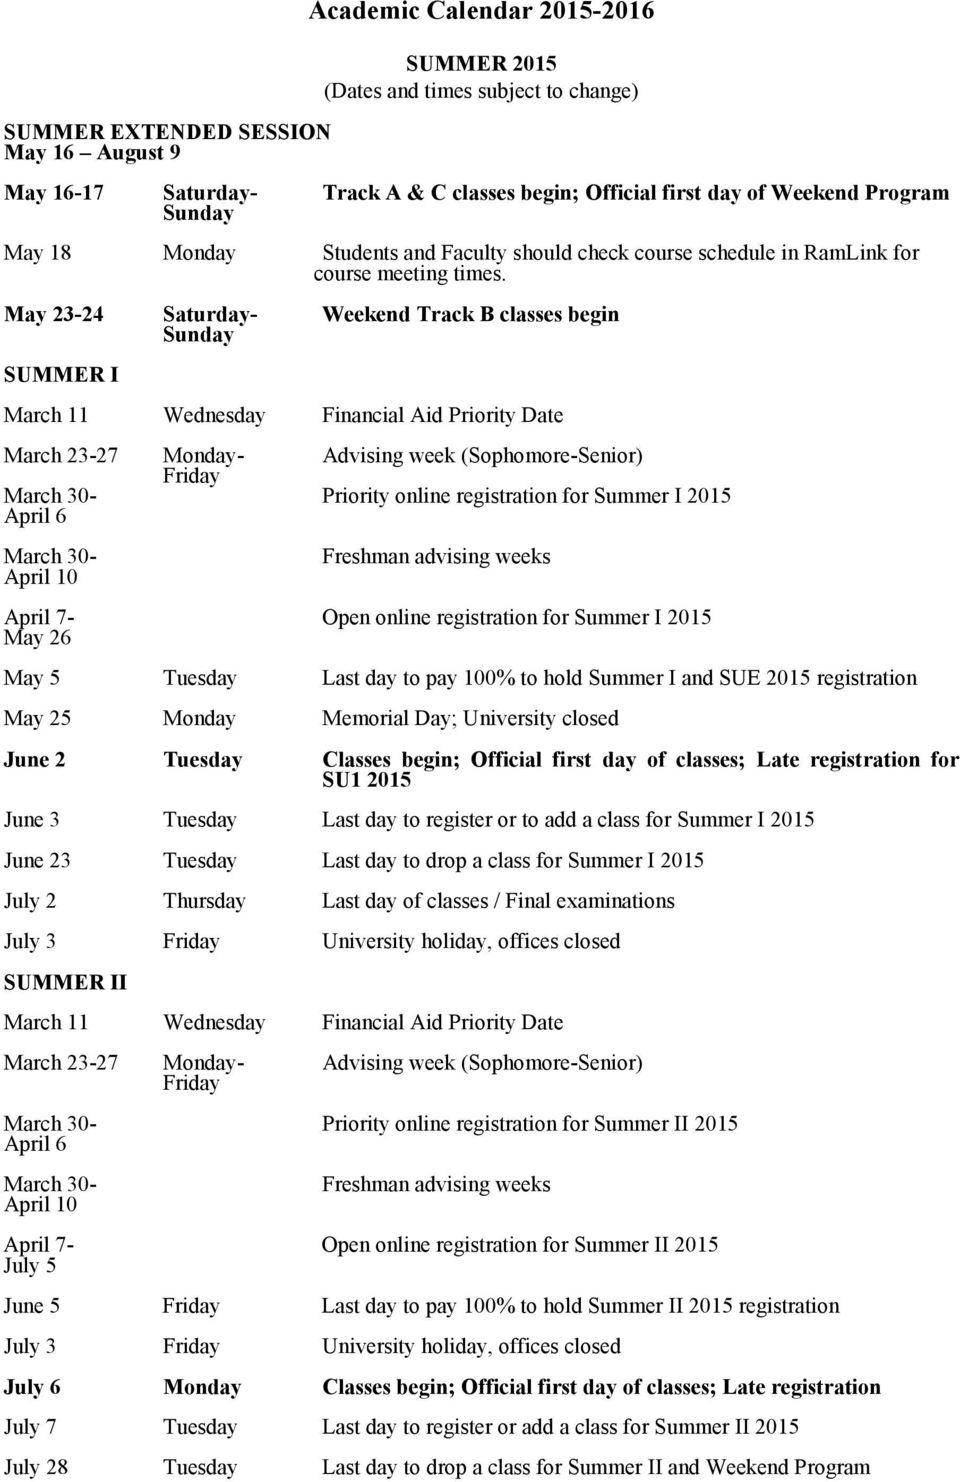 Academic Calendar – Pdf Free Download Within St Ambrose U Iverisry Academic.calendar